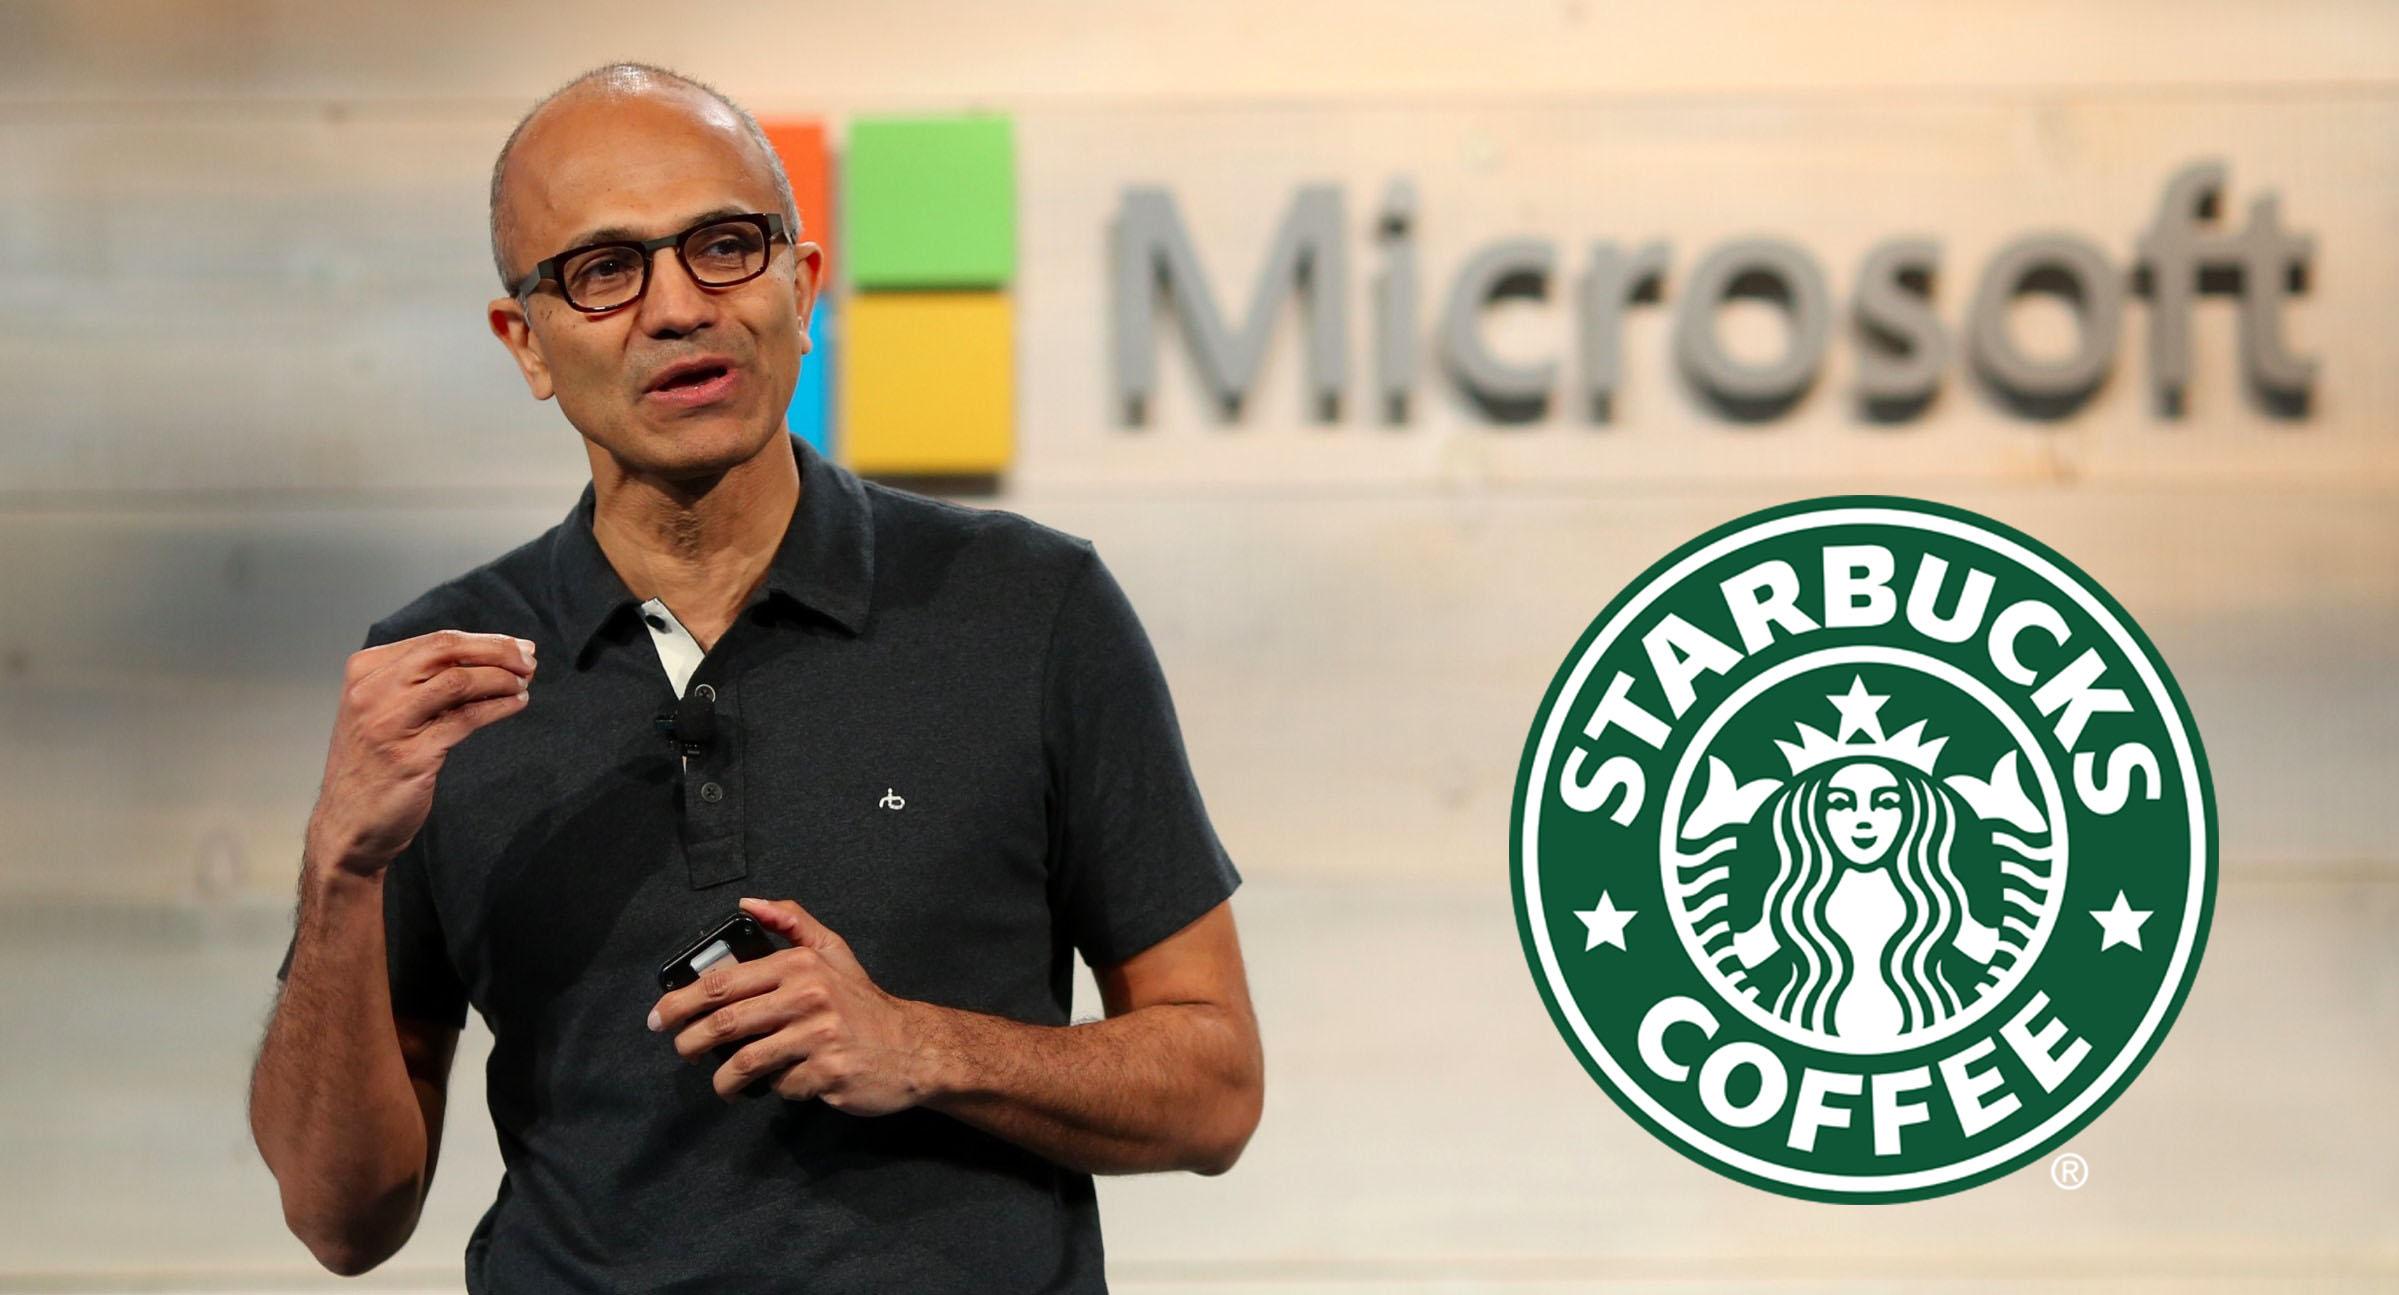 CEO da Microsoft entra para a Starbucks